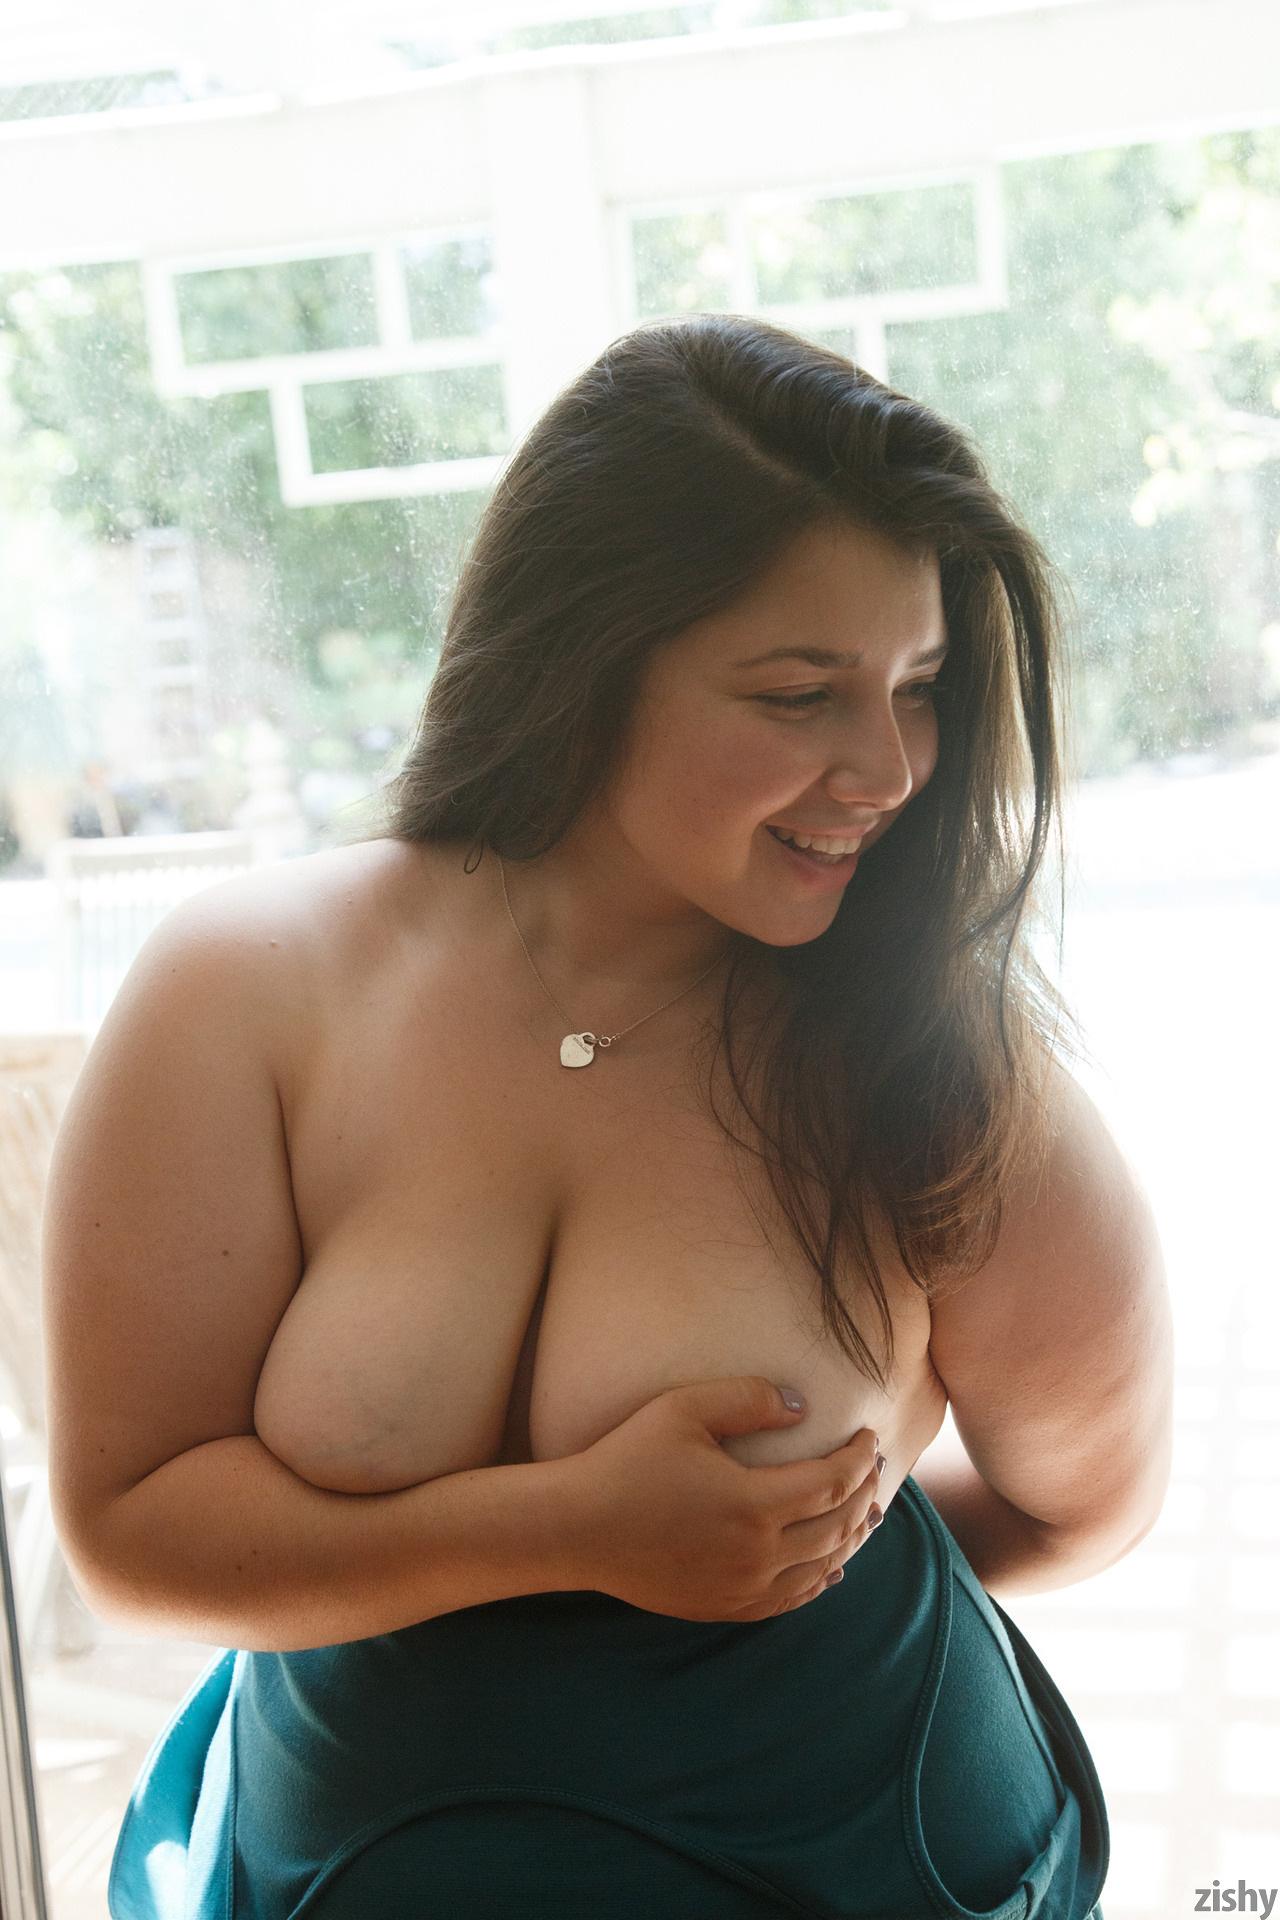 Carolina Munoz Hearts A Full Zishy (51)